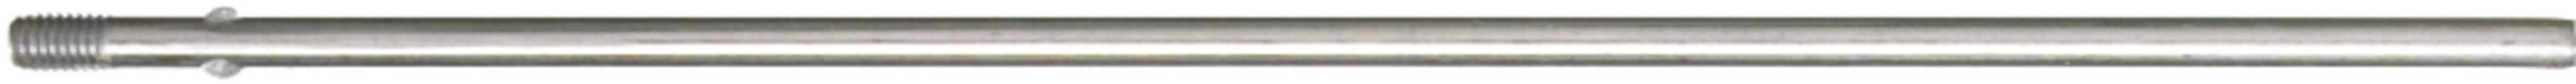 Lyk9 100mpuni 1889